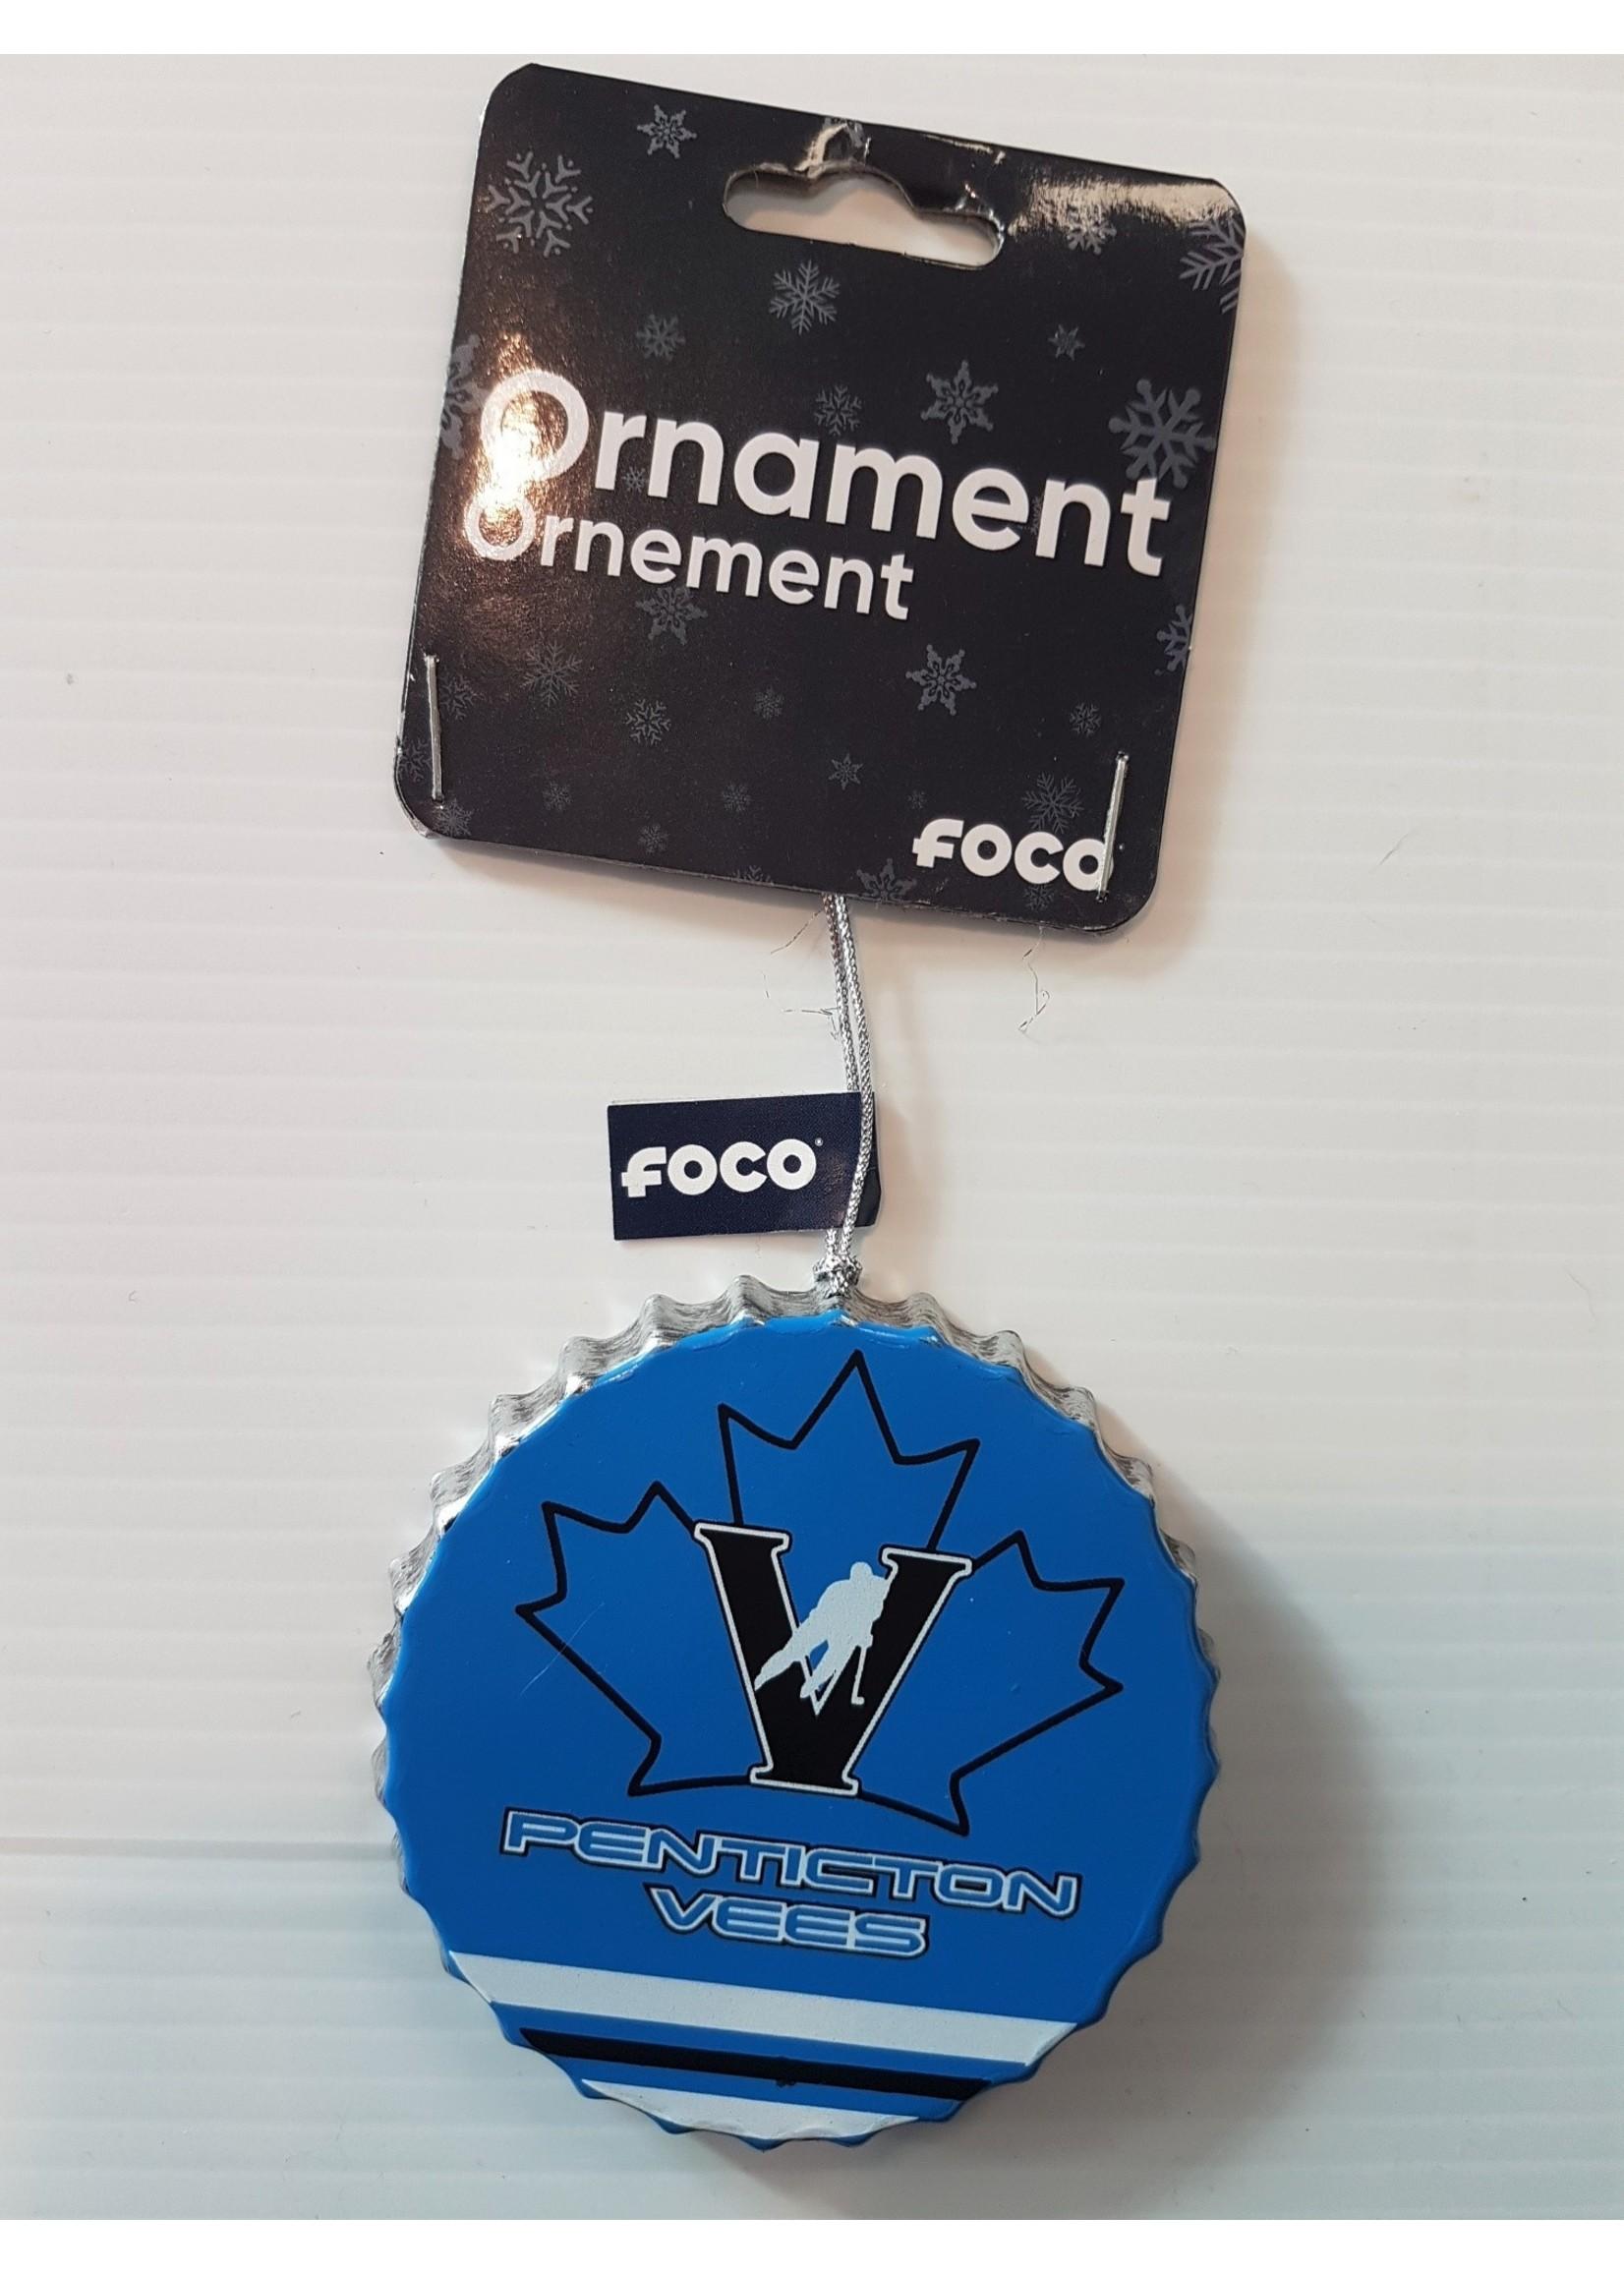 FOCO Penticton Vees Metal Ornament